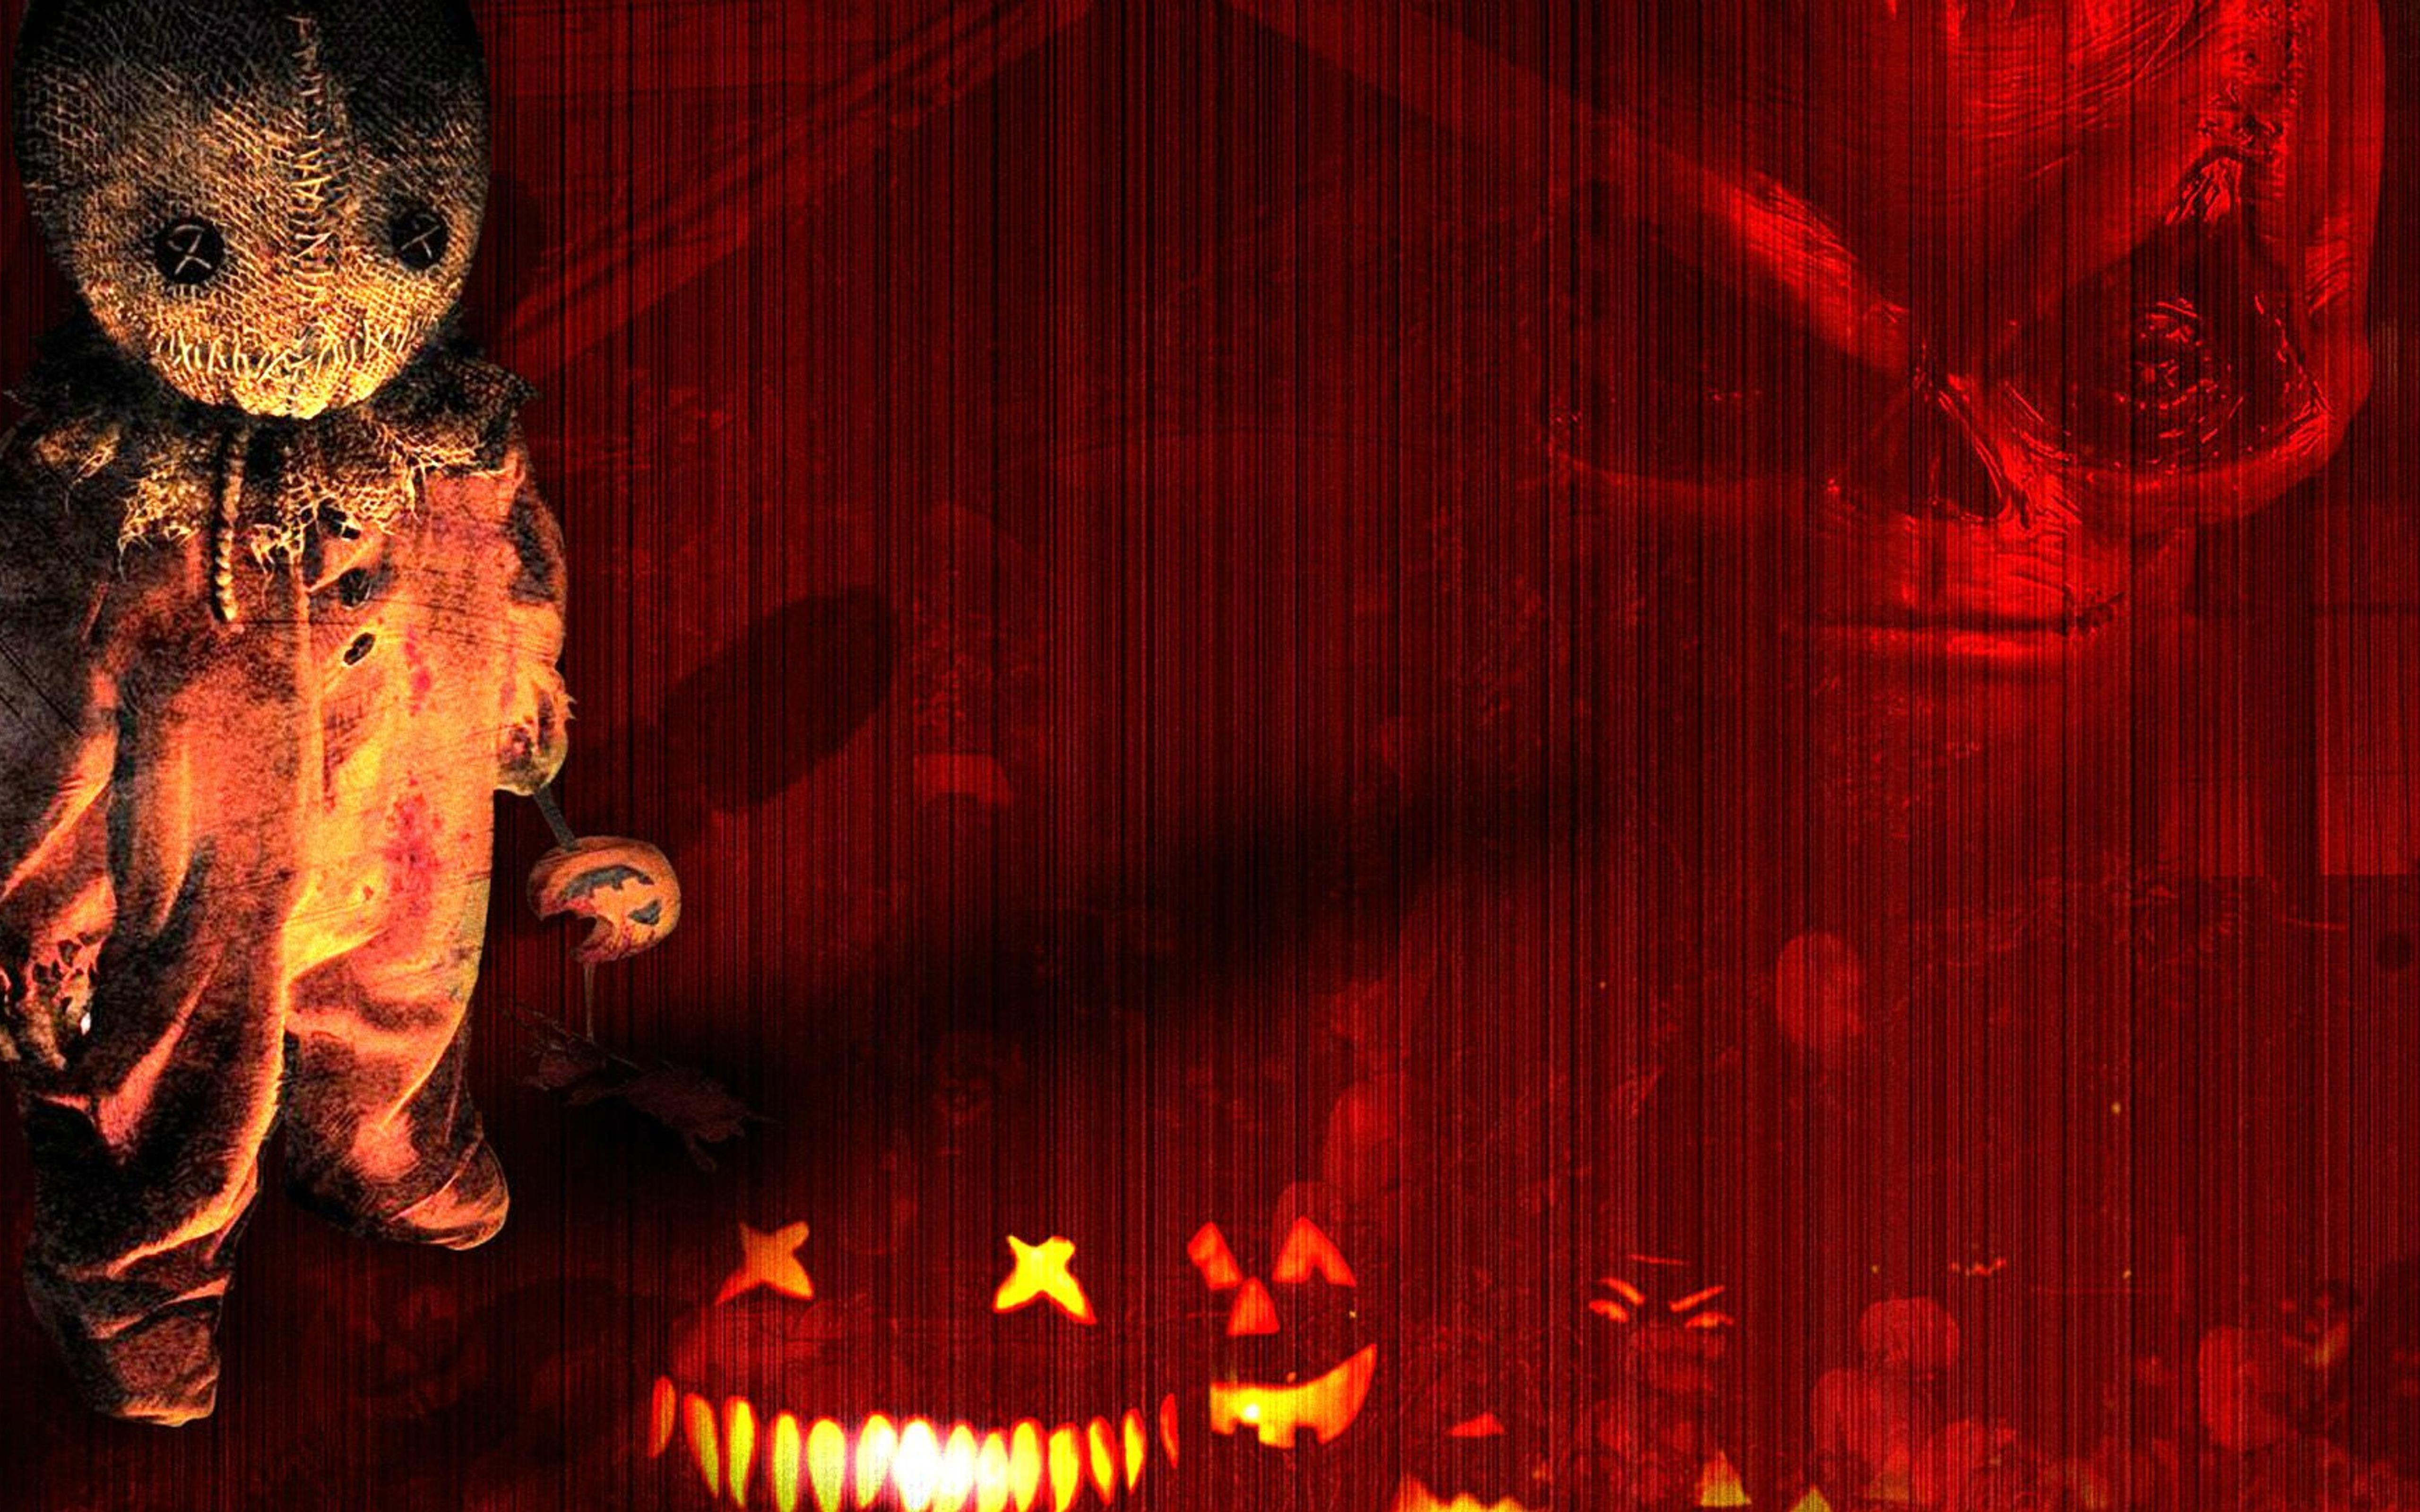 Simple Wallpaper Halloween Red - ghost-and-pumpkins-halloween-night-5120x3200  Snapshot_533042.jpg